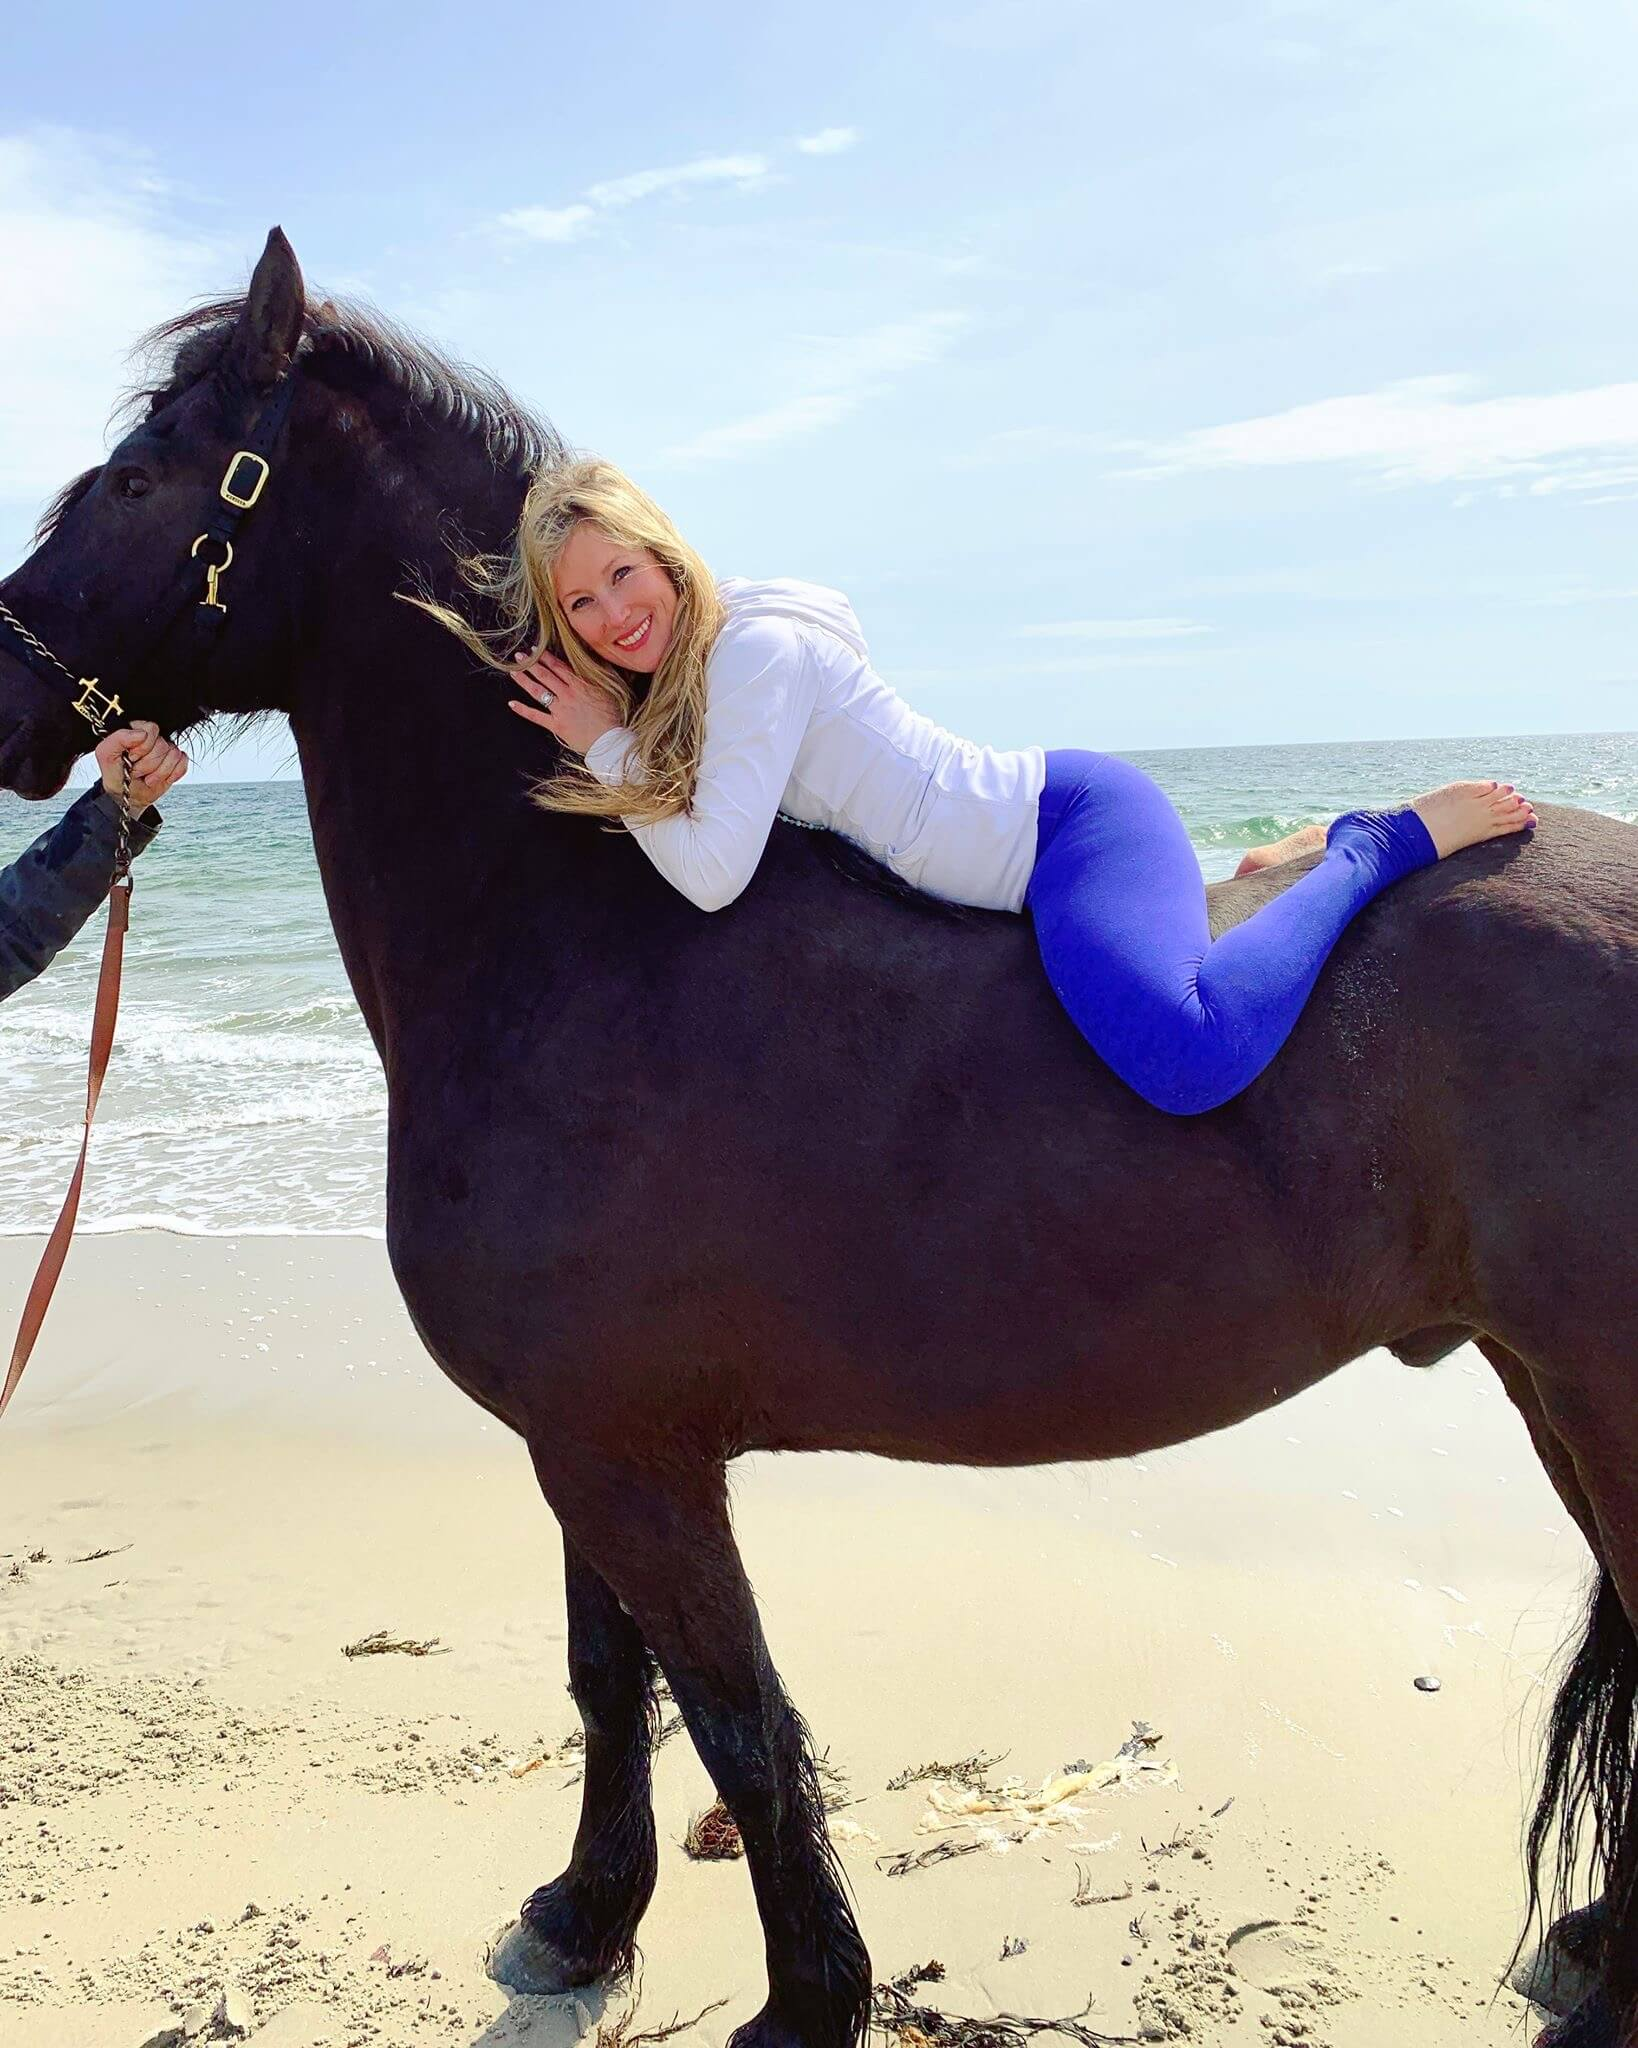 maine-yoga-retreats-horses-20190409-1732